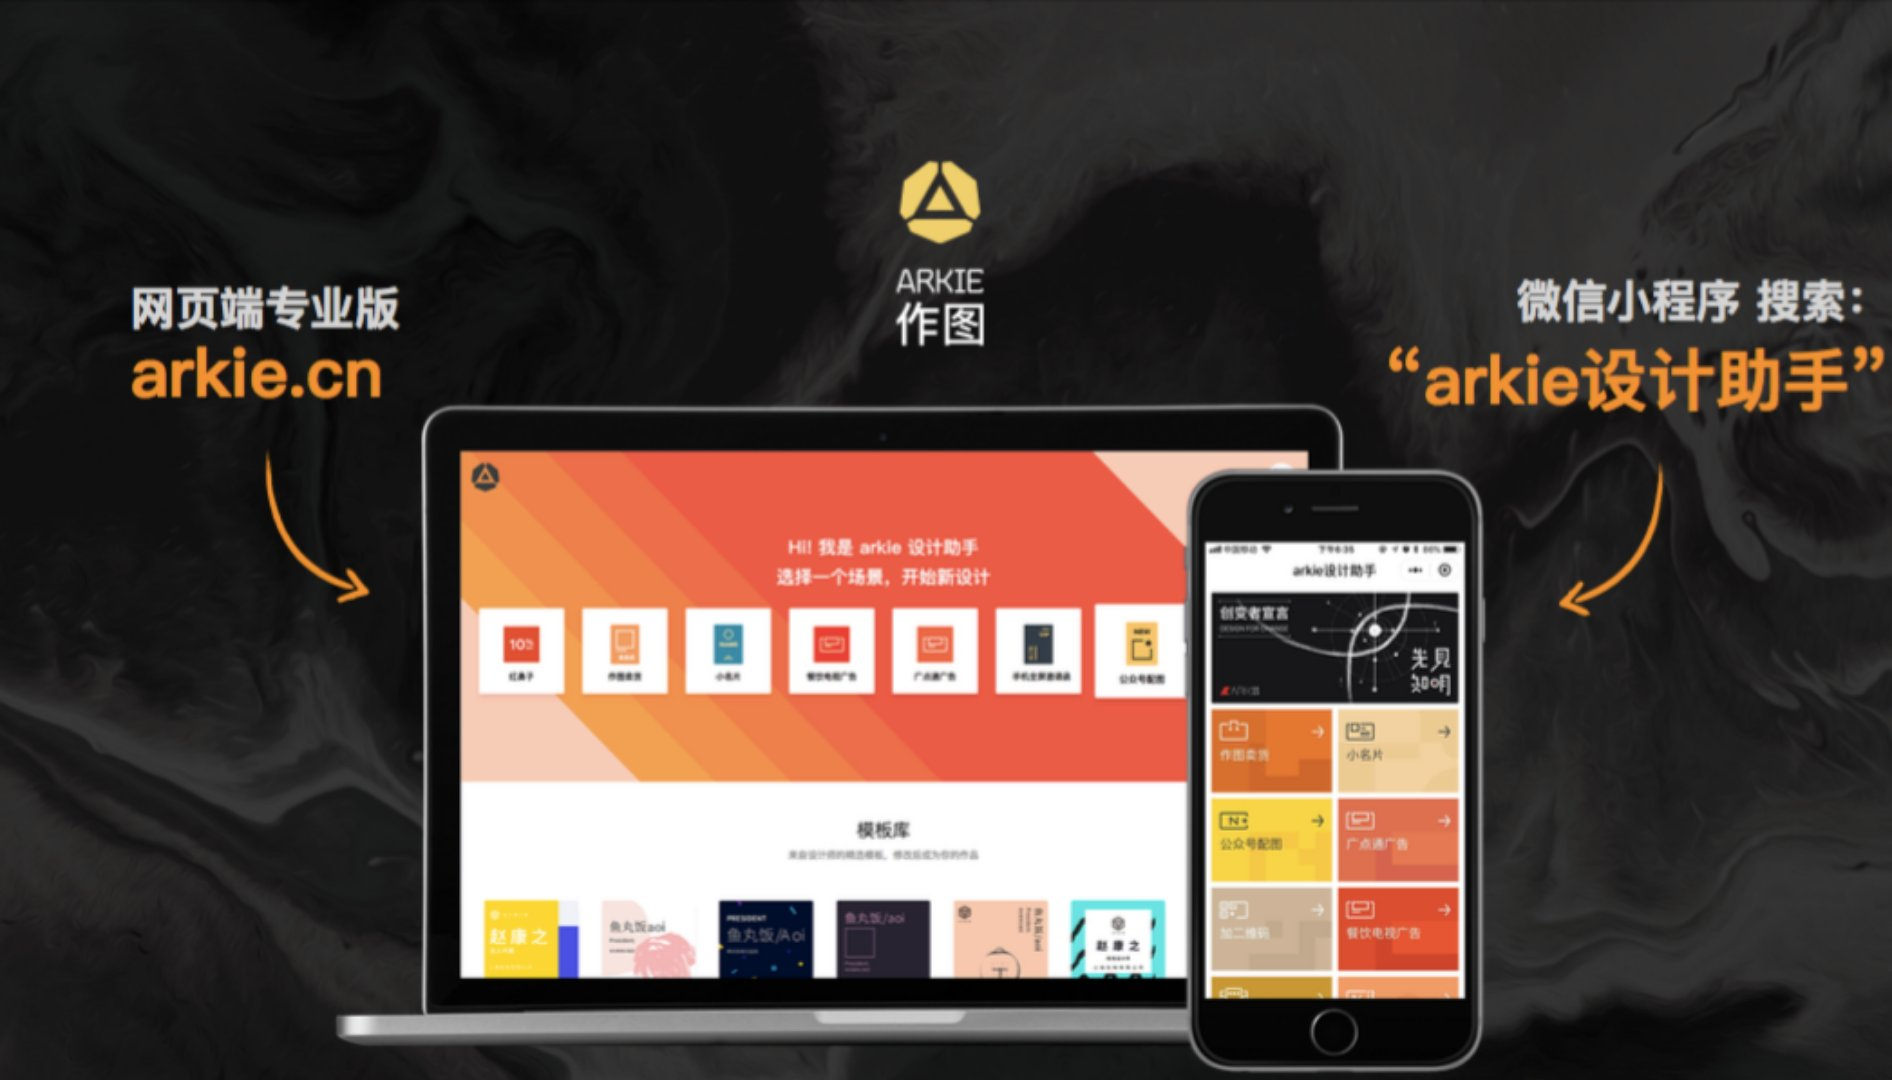 ARKIE作图专业生产营销模式